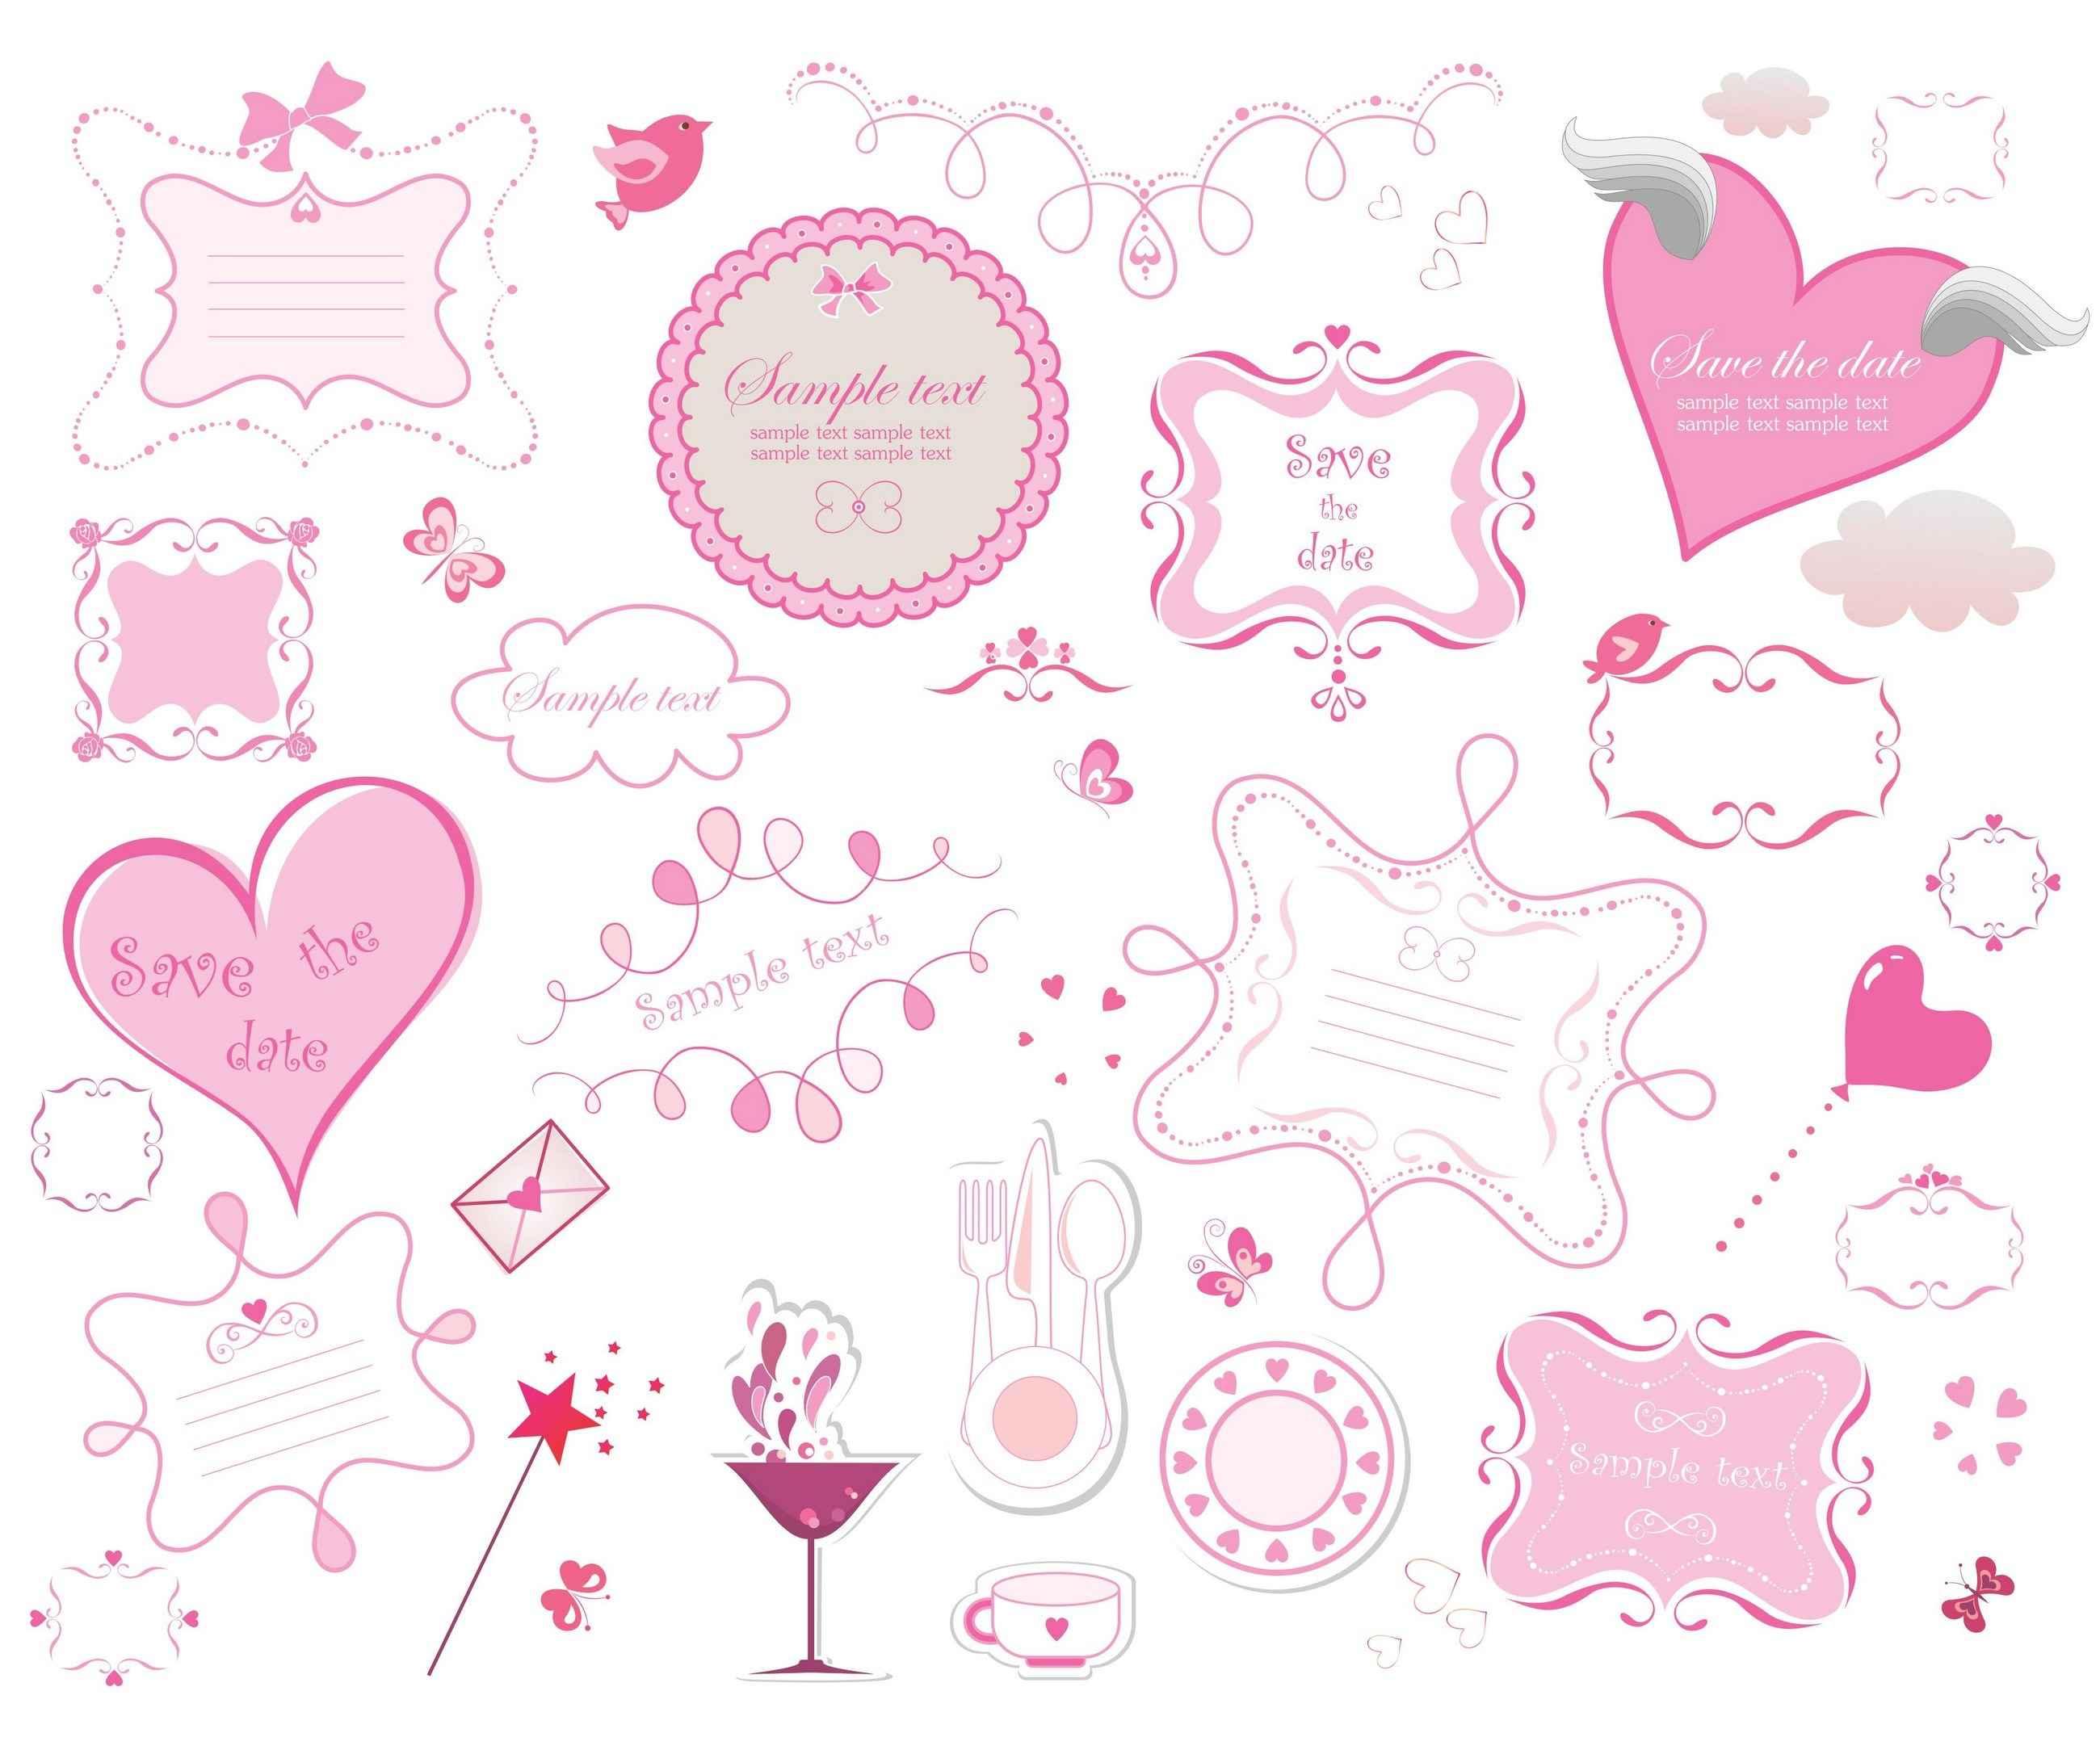 Romantic love design elements Vecto Pack [EPS File] png